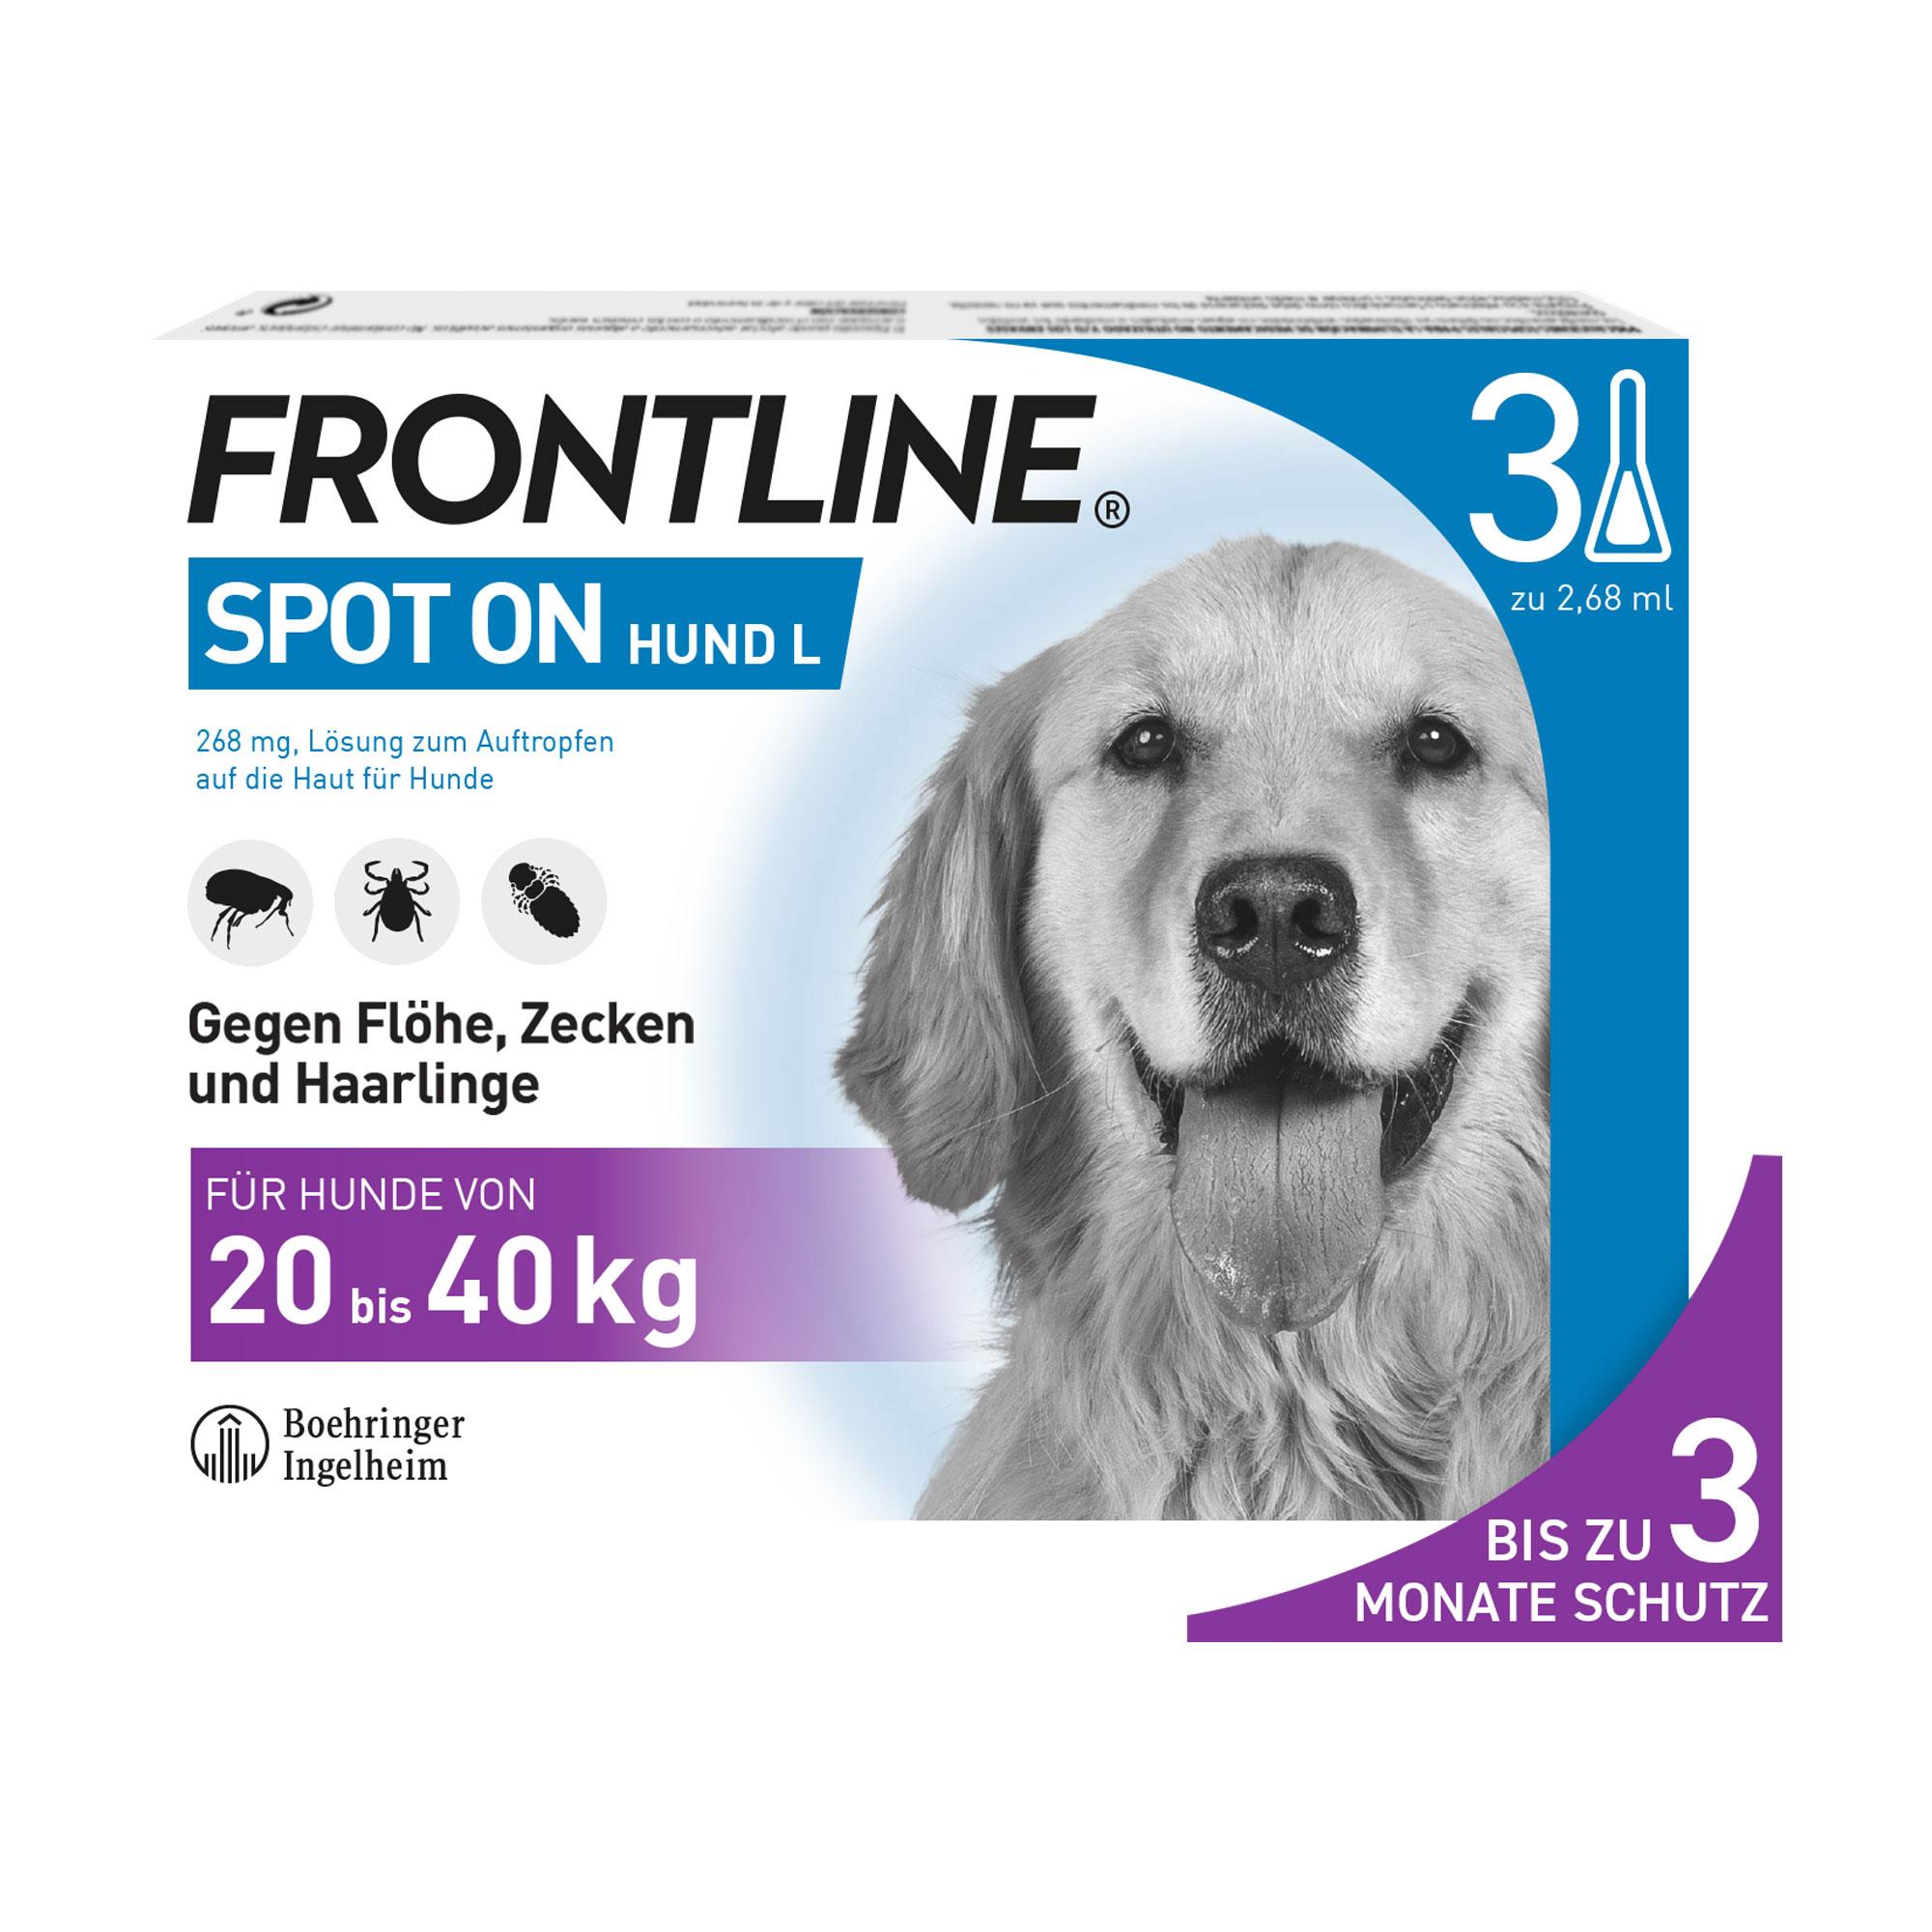 Frontline Spot on Hund L